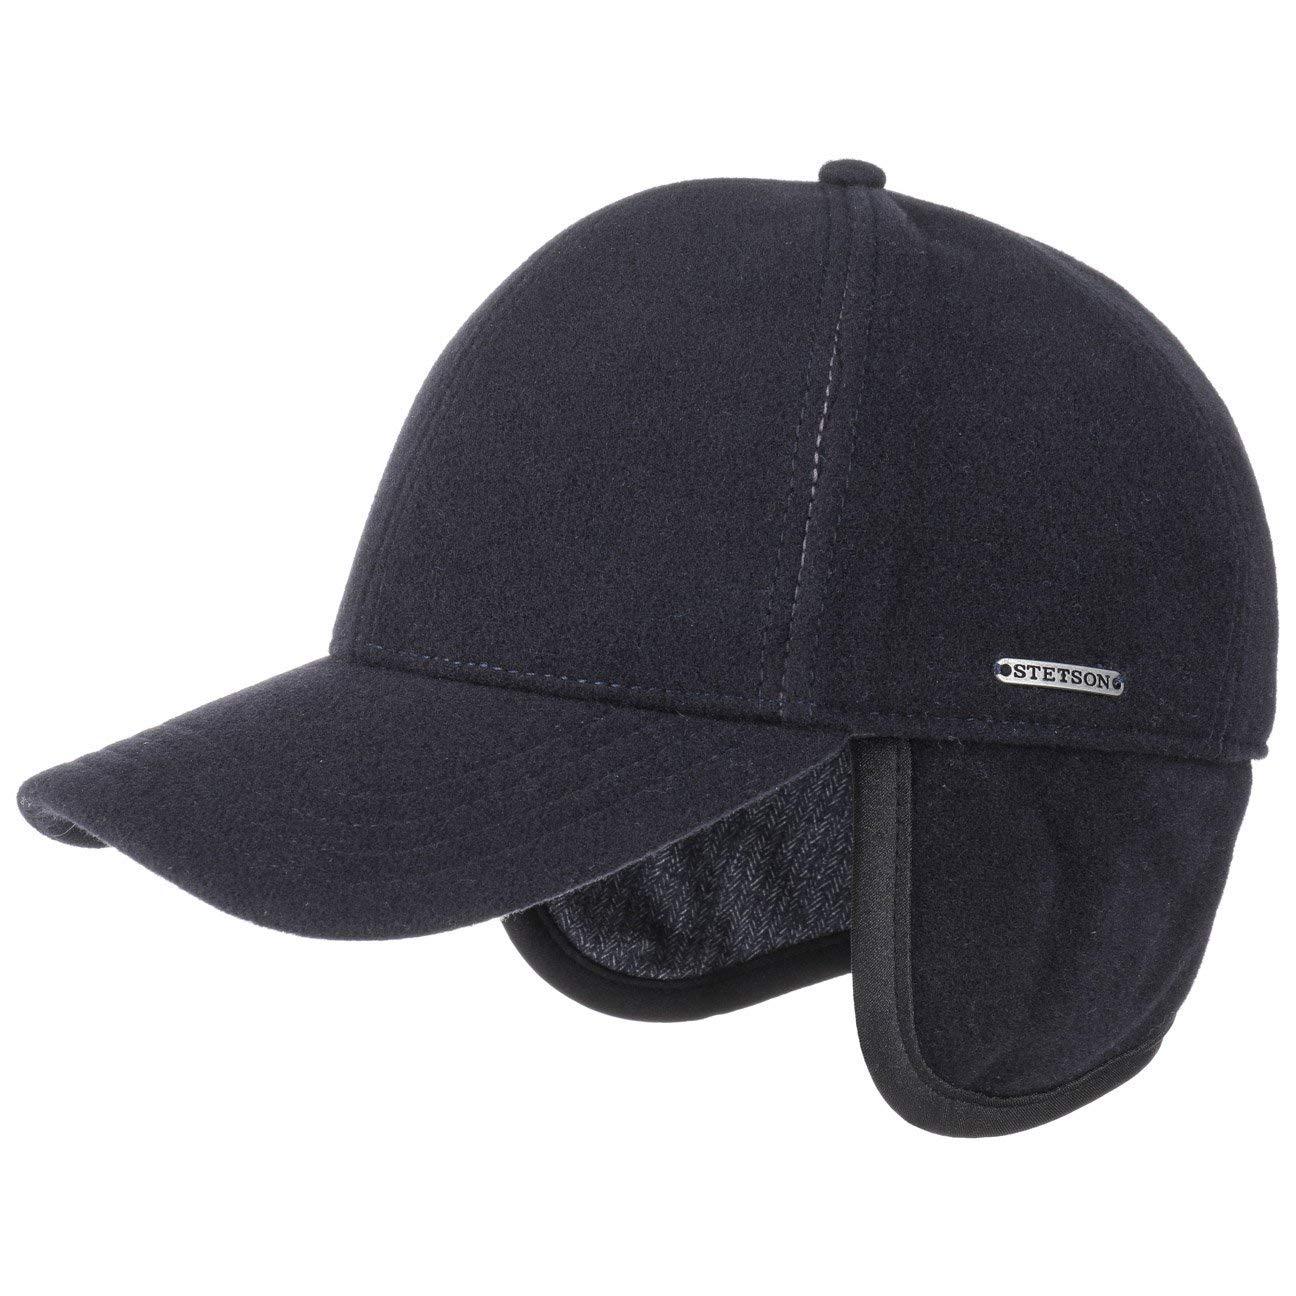 726ea1b2c46 Amazon.com  Stetson Wool  Cashmere Baseball Cap  Clothing